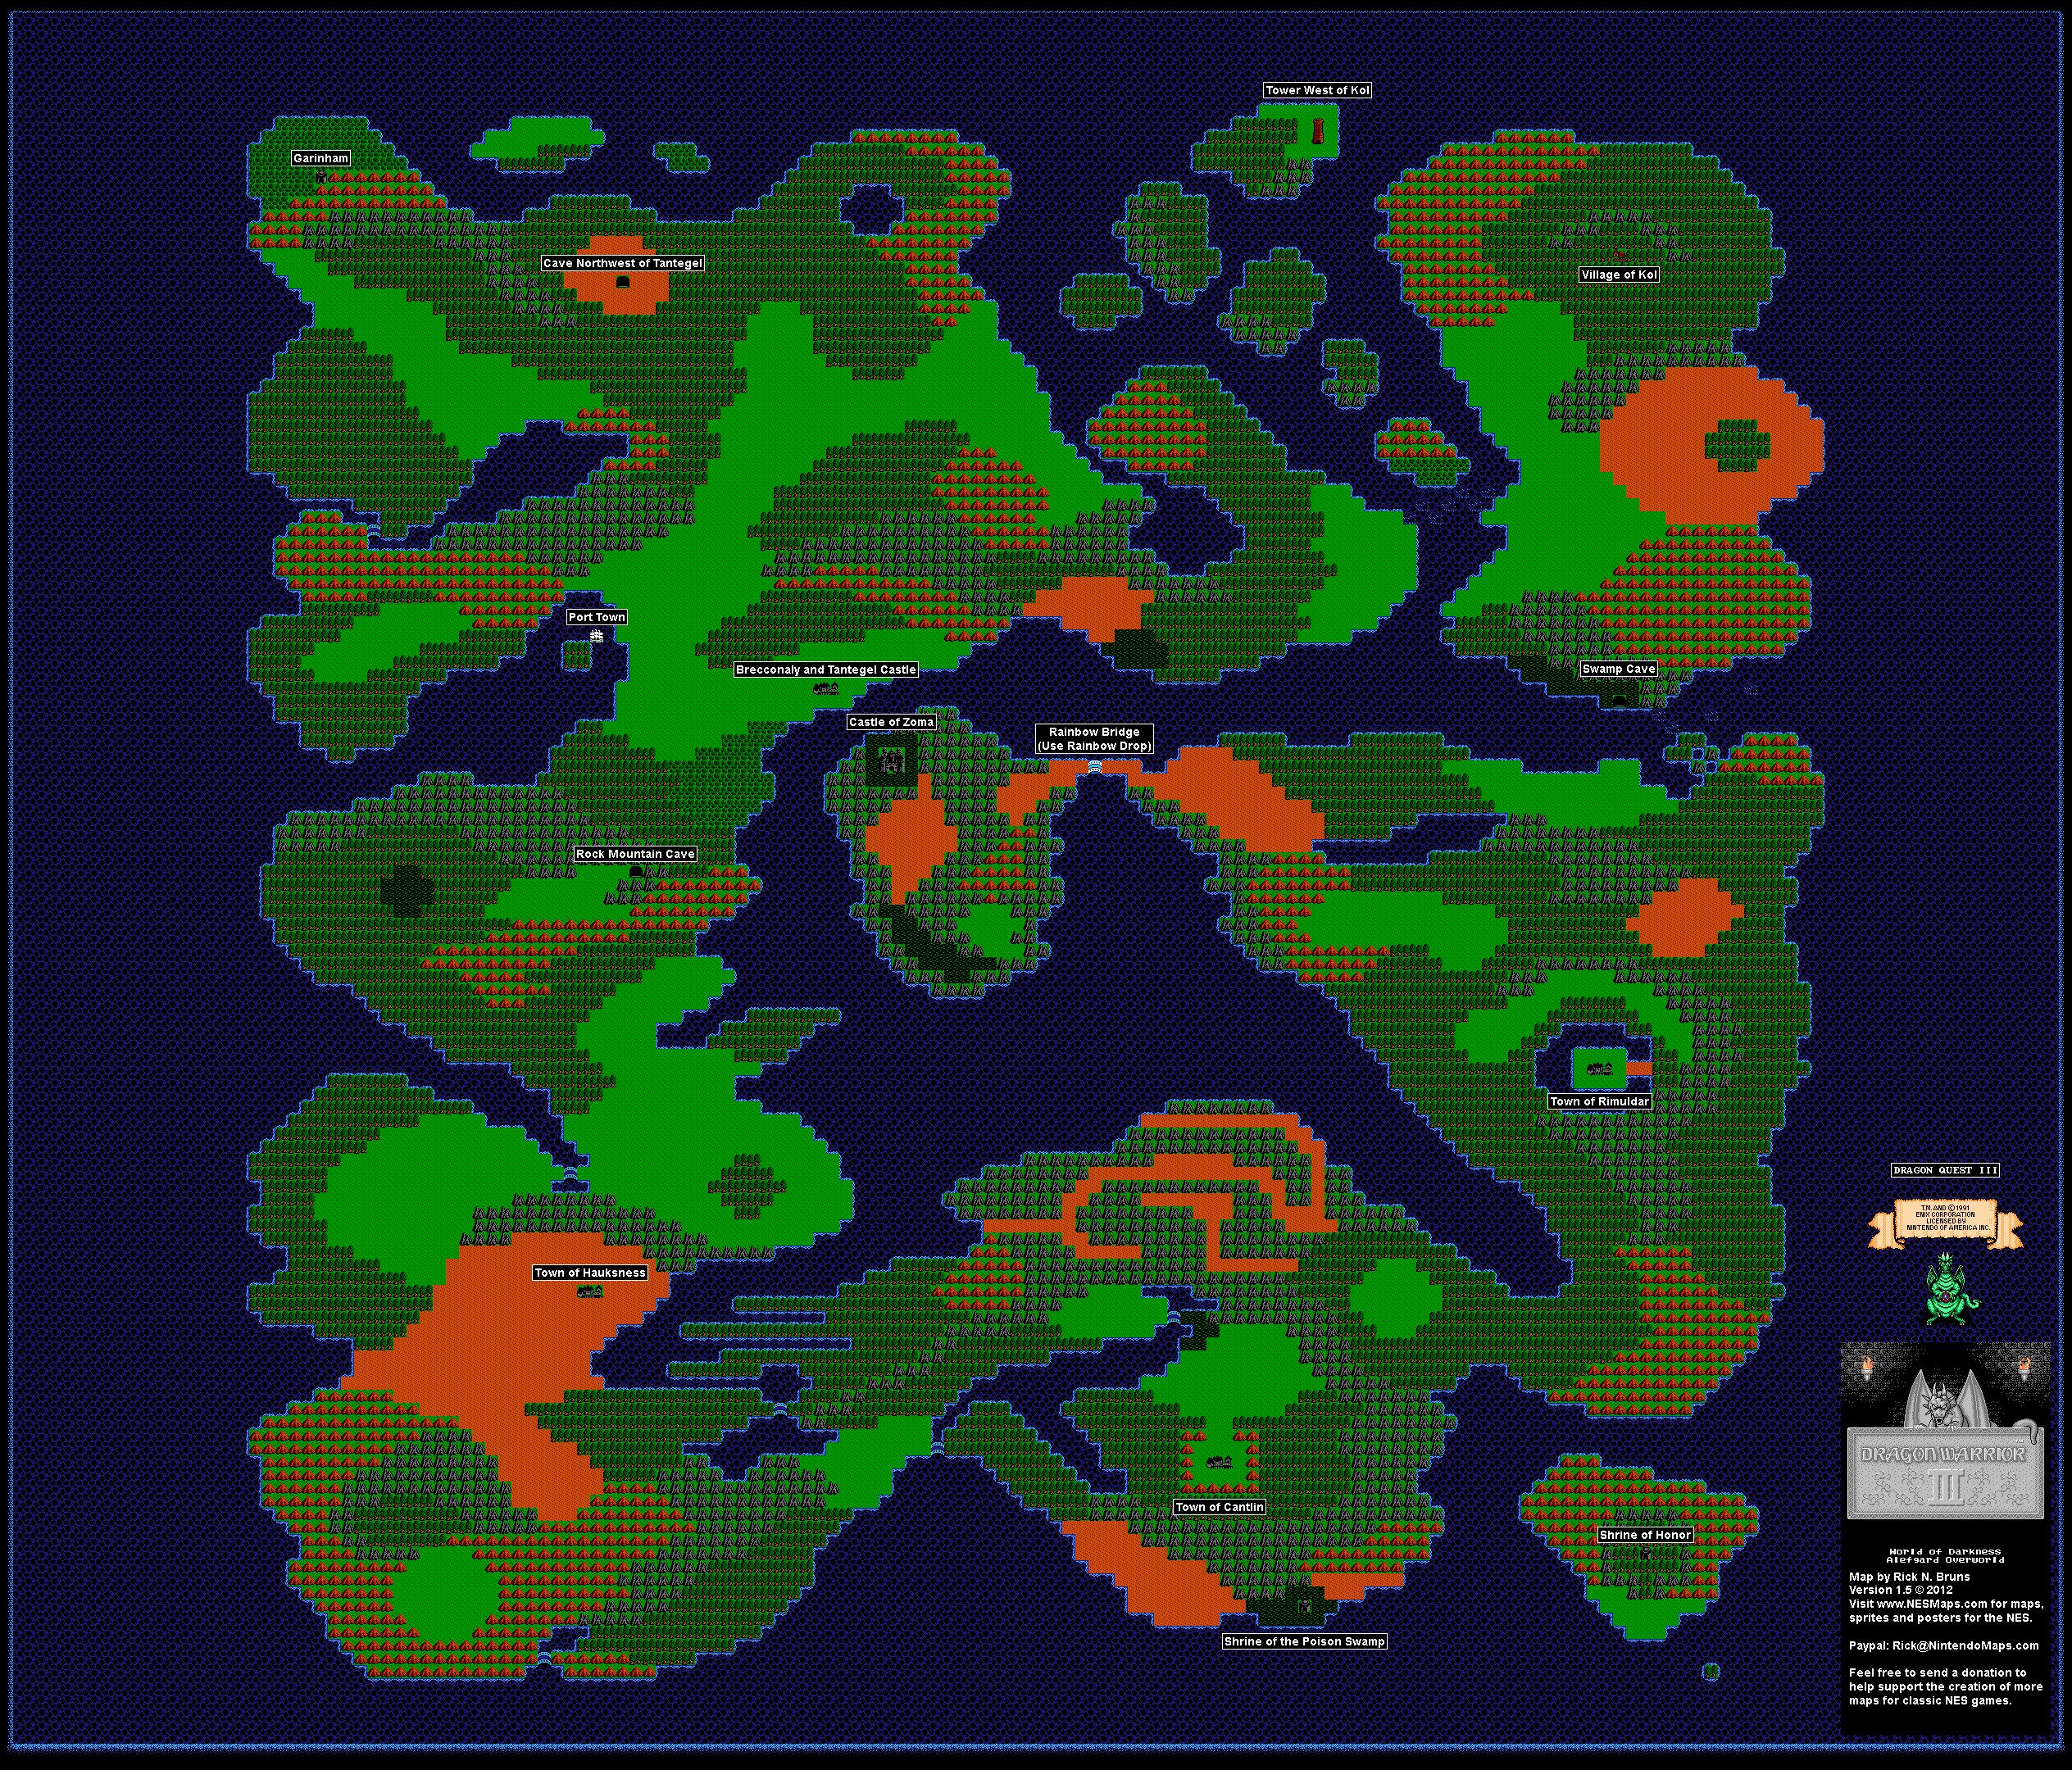 Dragon Warrior World Map Dargon Warrior III   World of Darkness Alefgard Overworld Nintendo